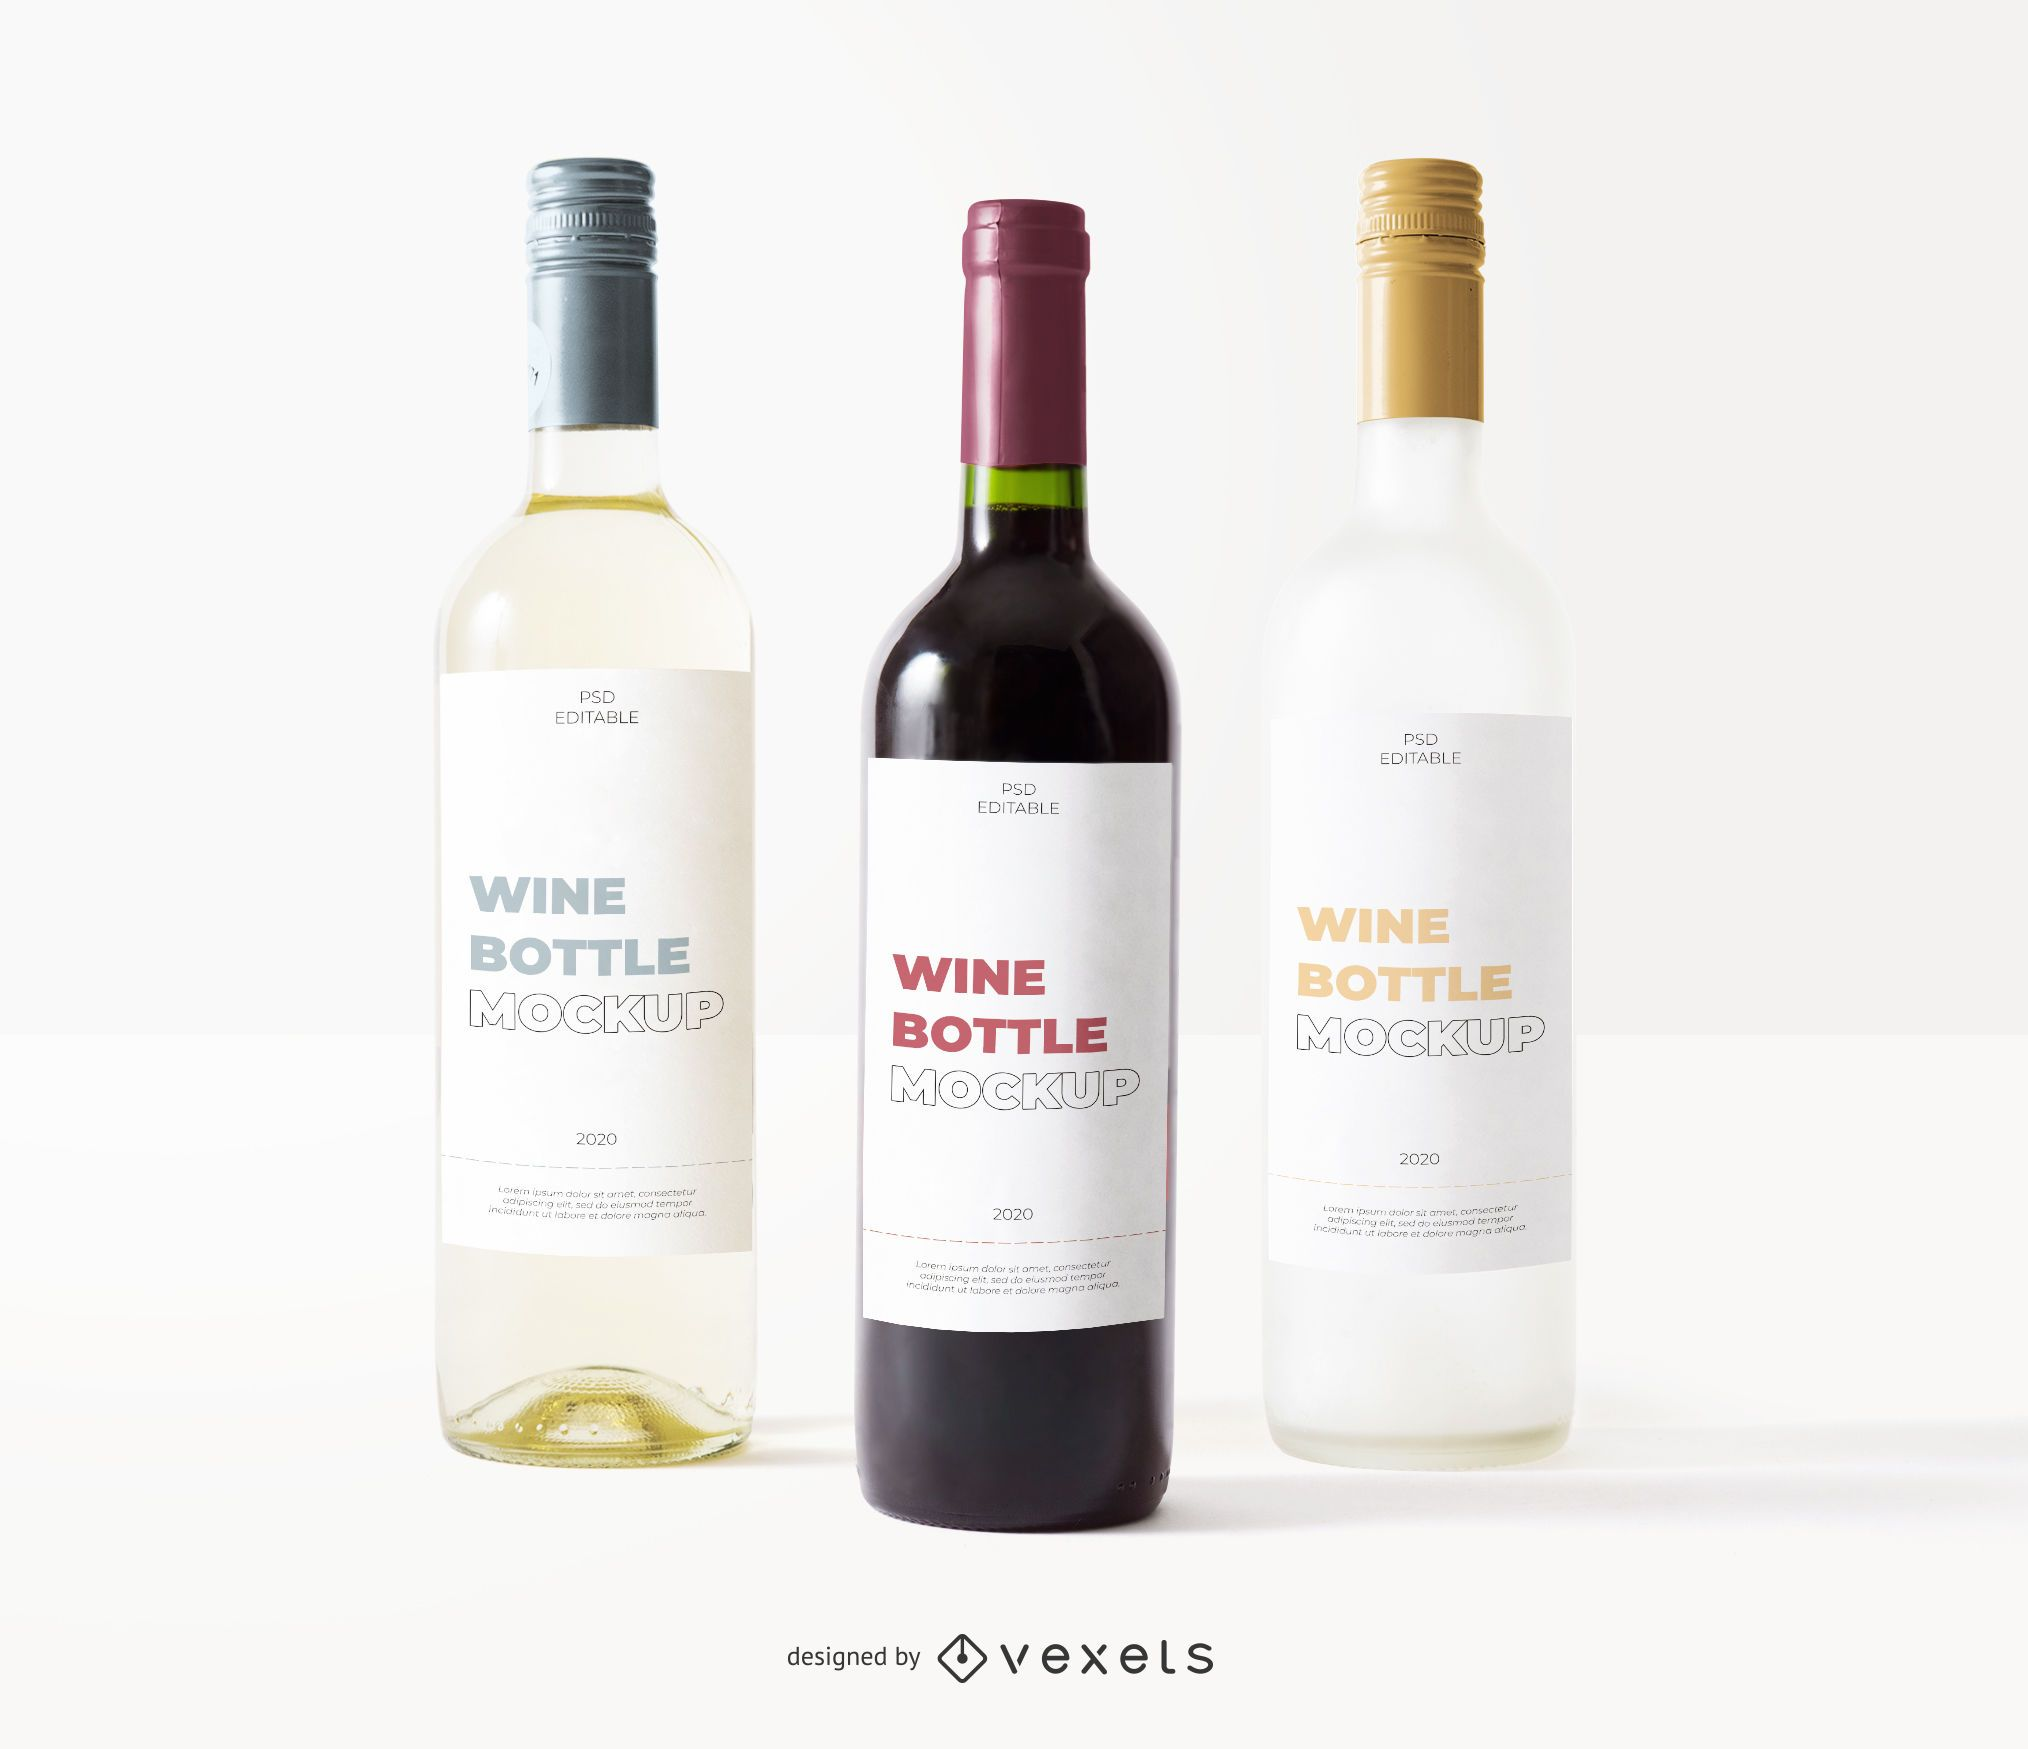 maqueta de etiqueta de tres botellas de vino